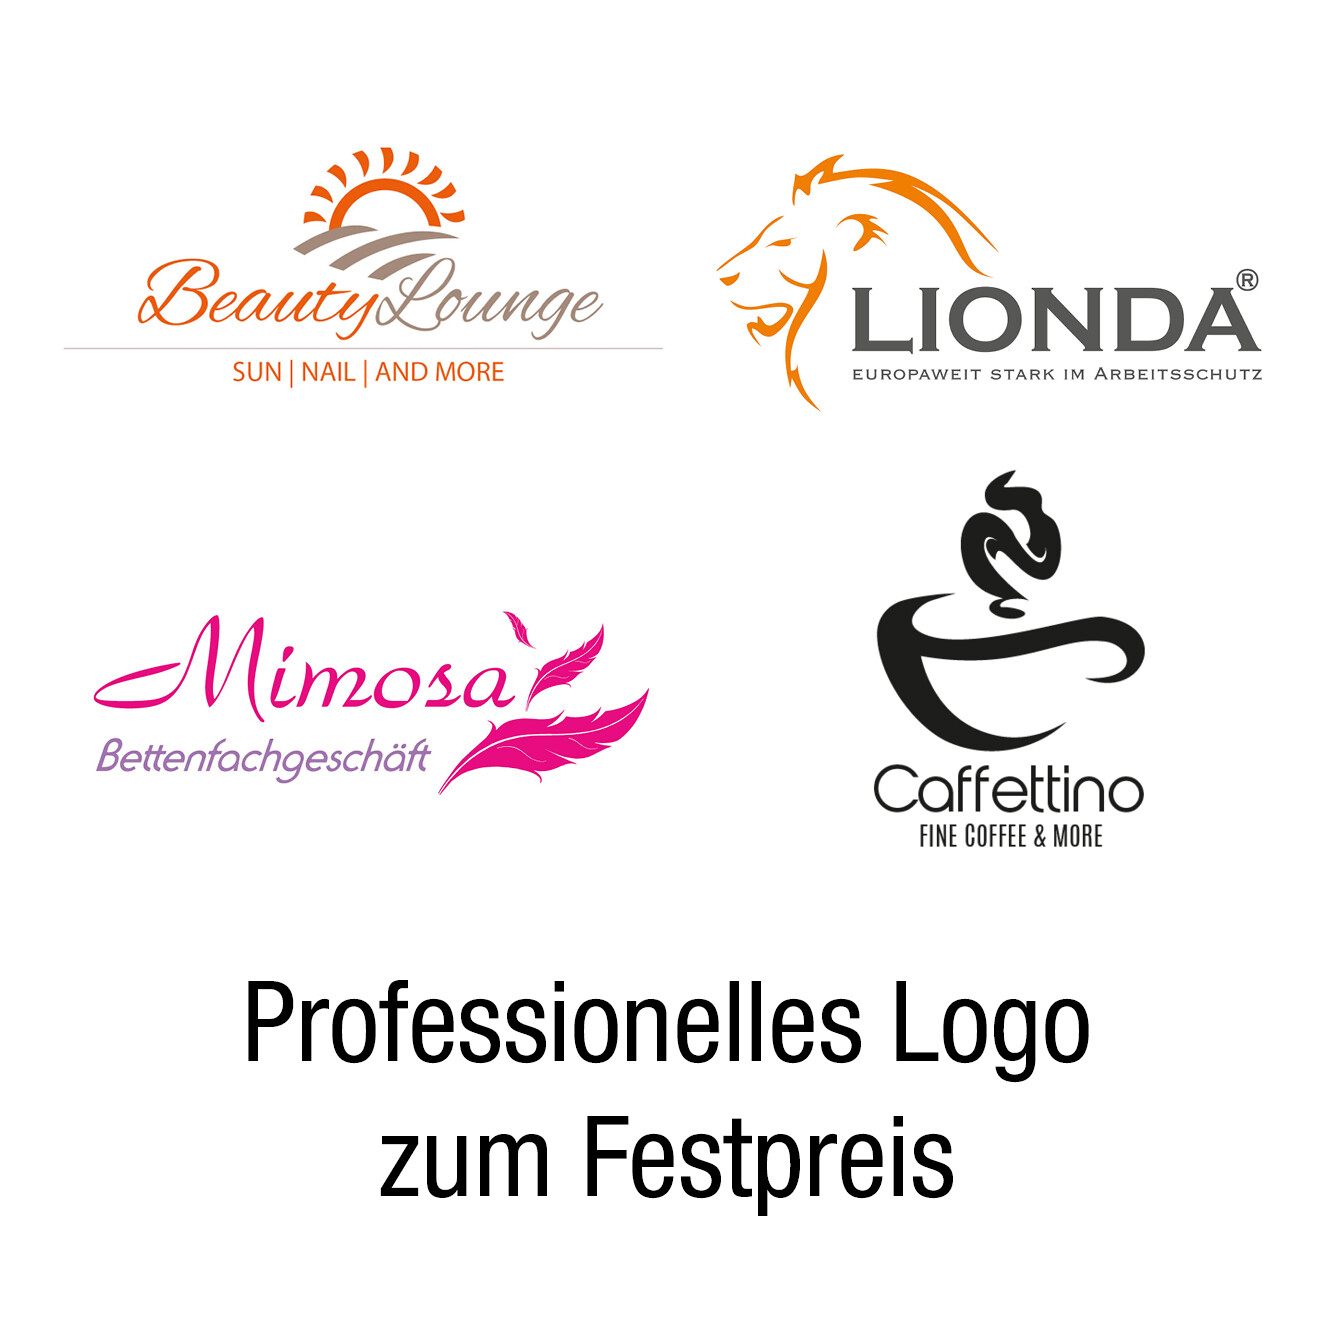 Professionelles Logo zum Festpreis